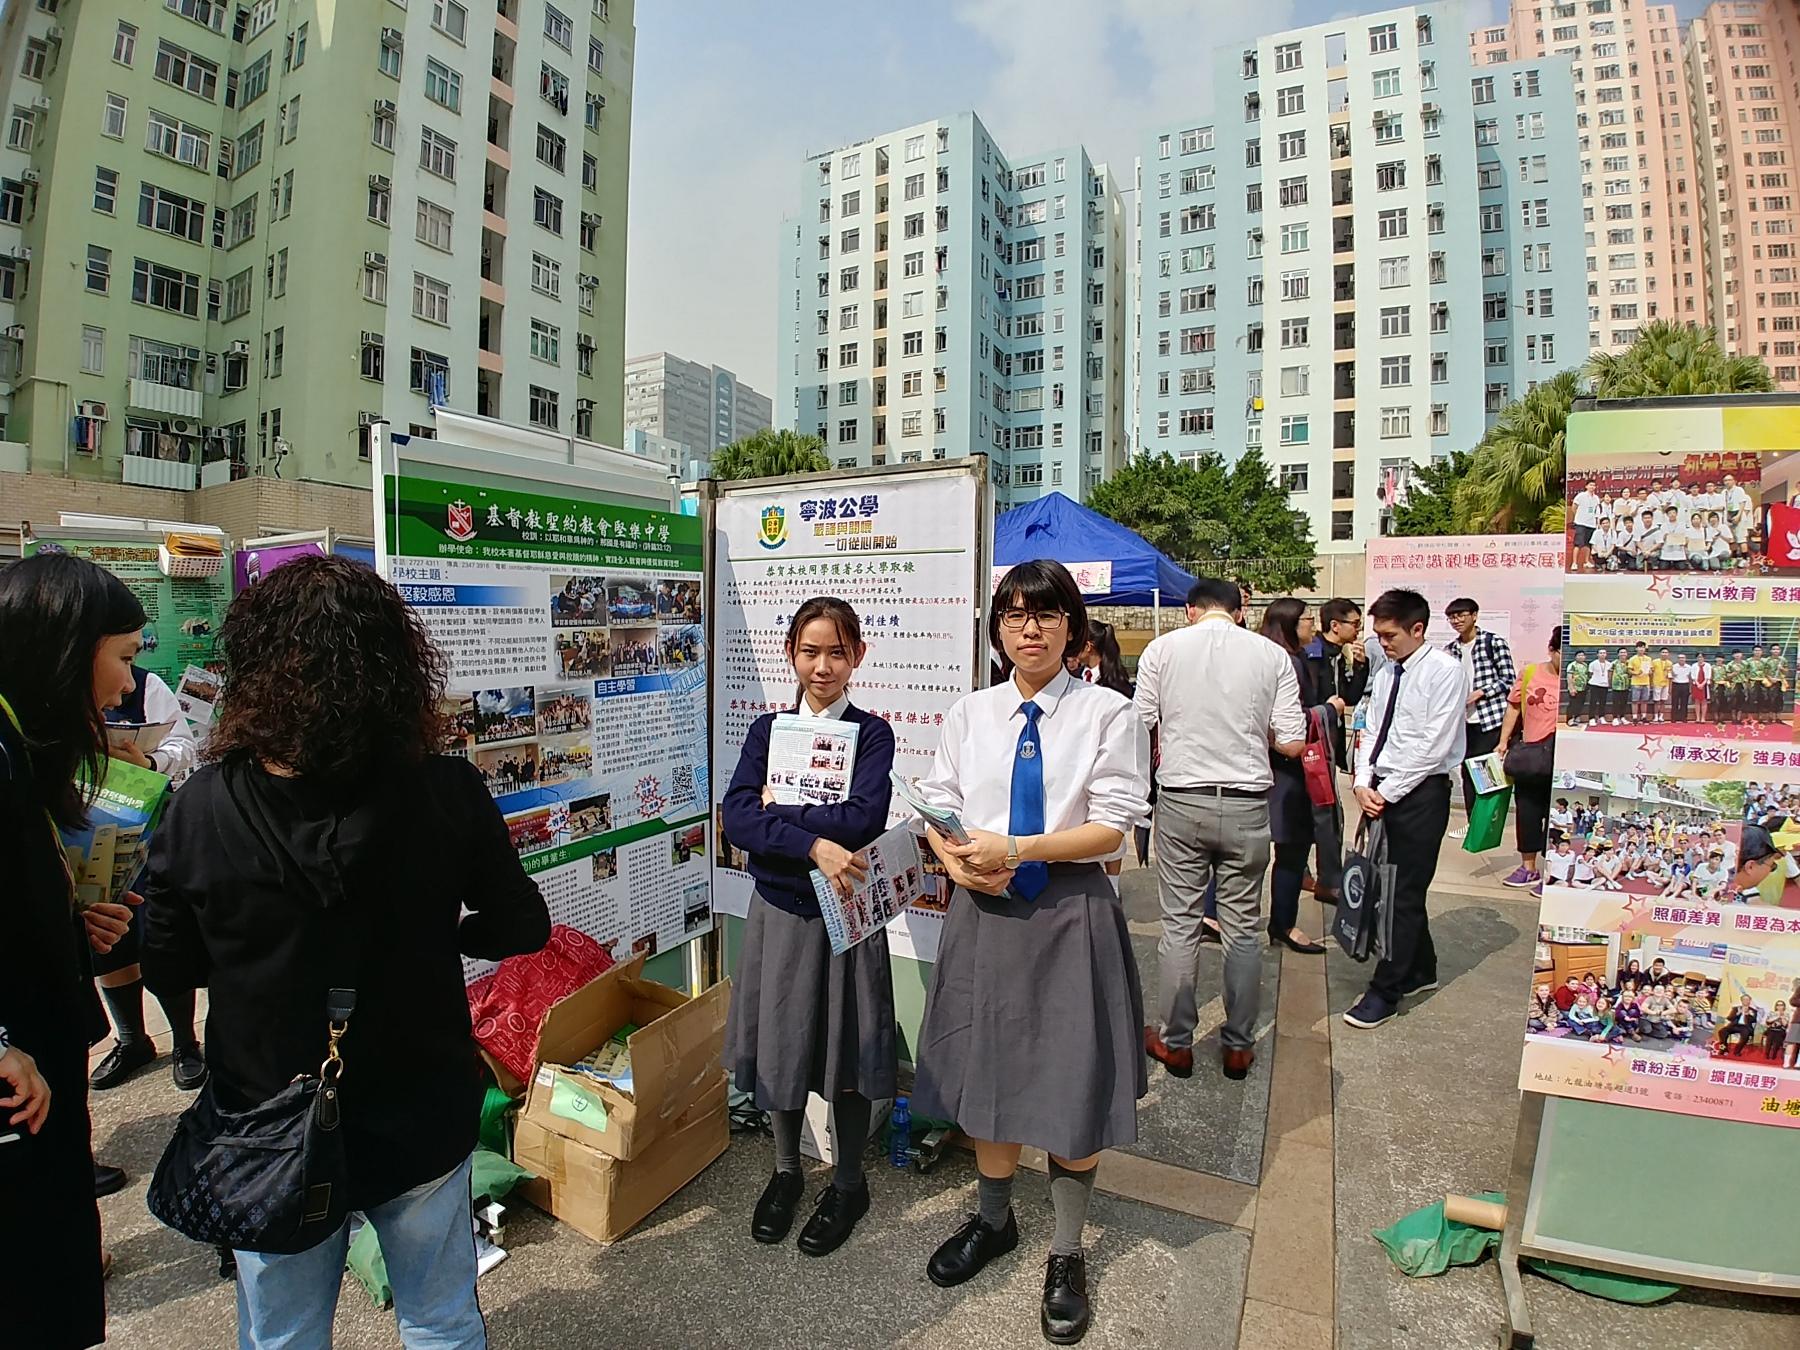 http://npc.edu.hk/sites/default/files/20190112_132257_hdr.jpg